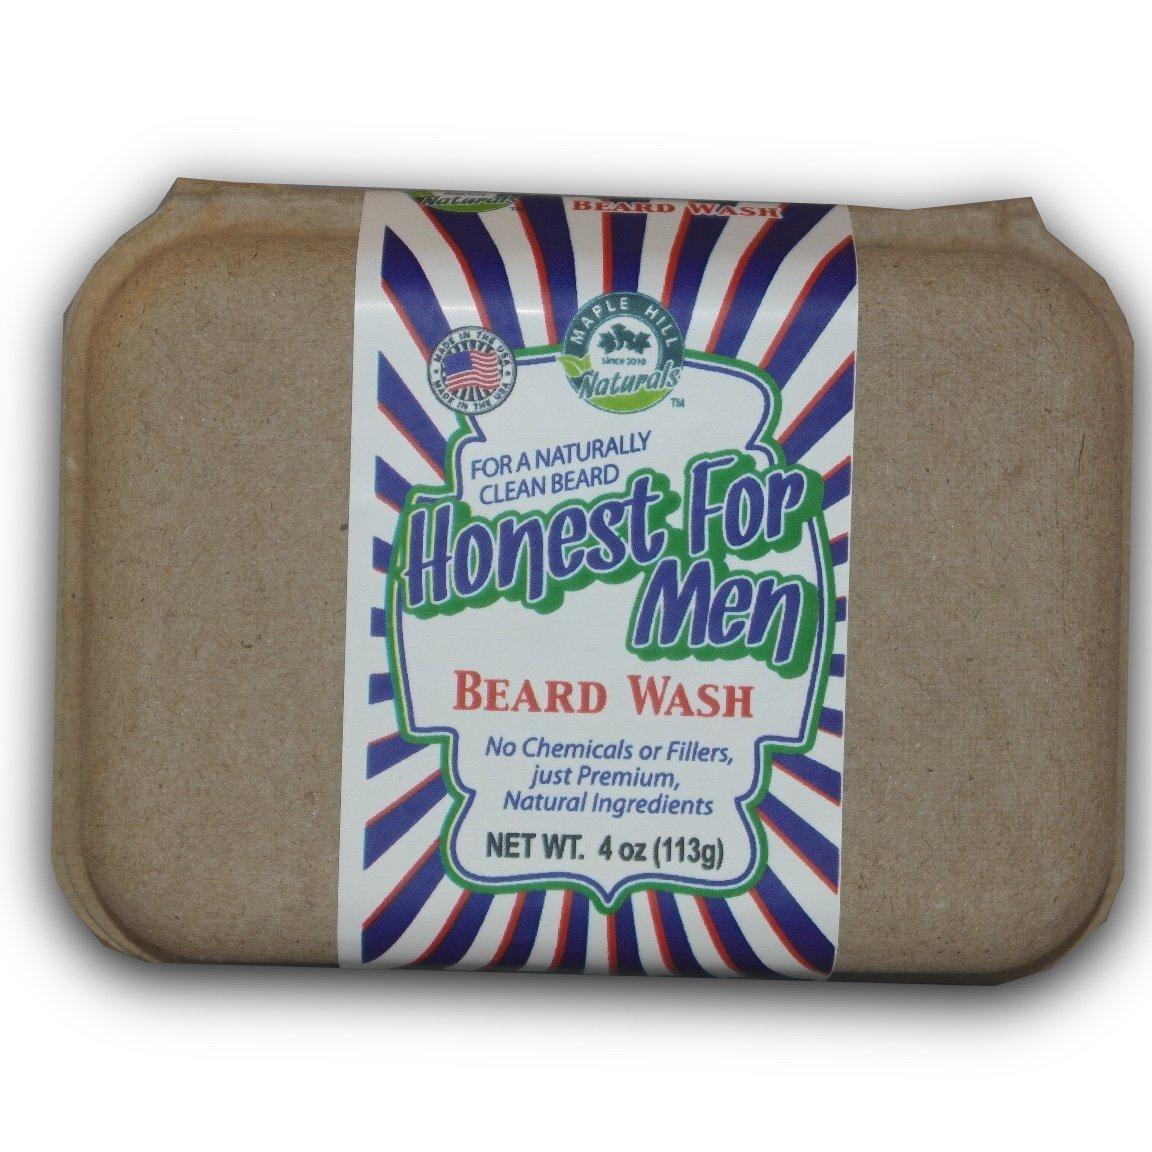 Maple Hill Naturals - Honest For Men